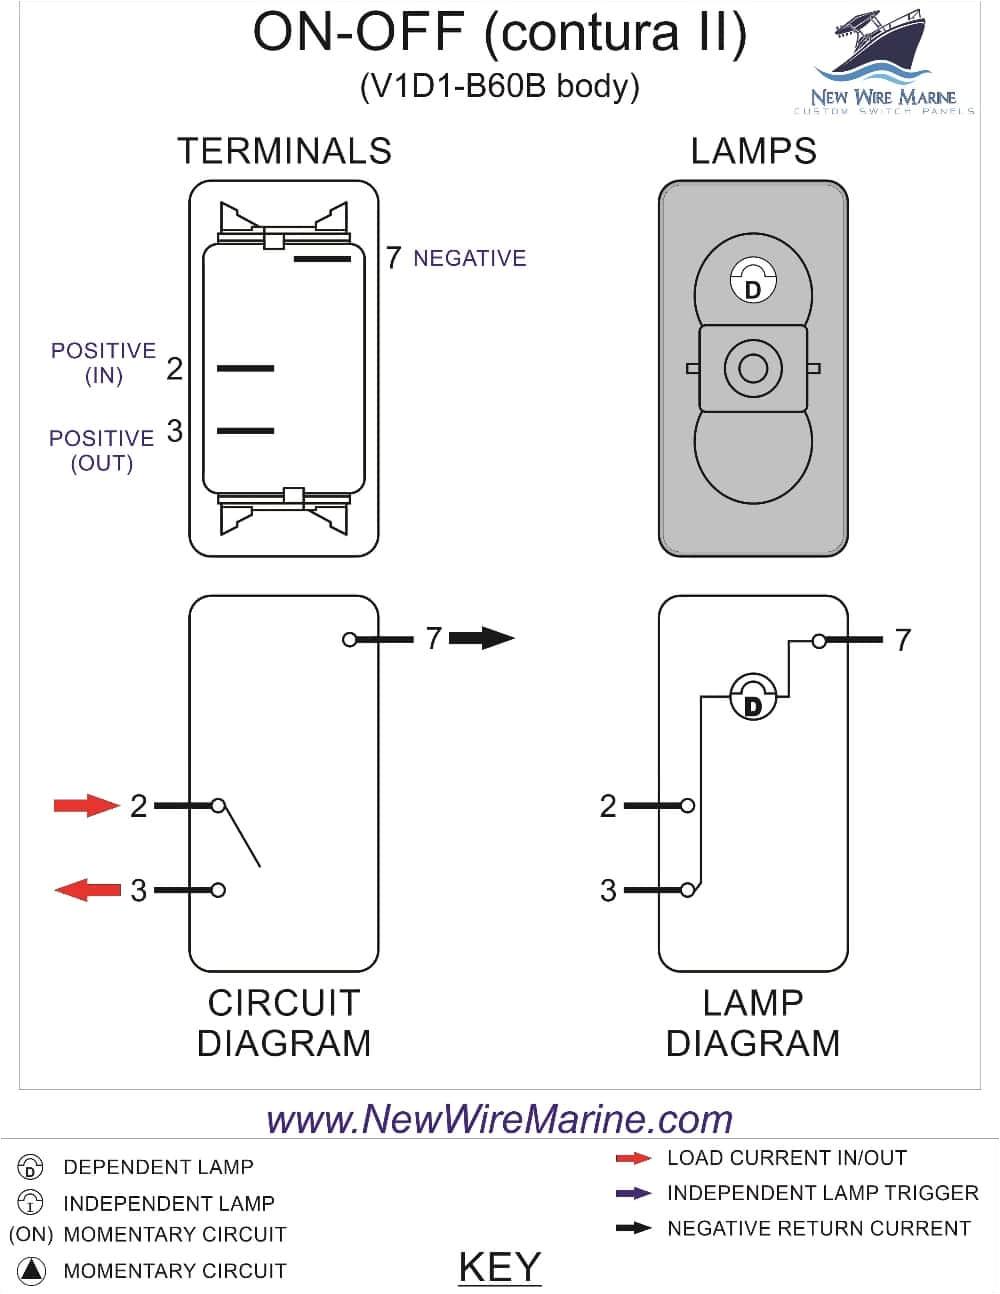 on off contura ii wiring diagram jpg